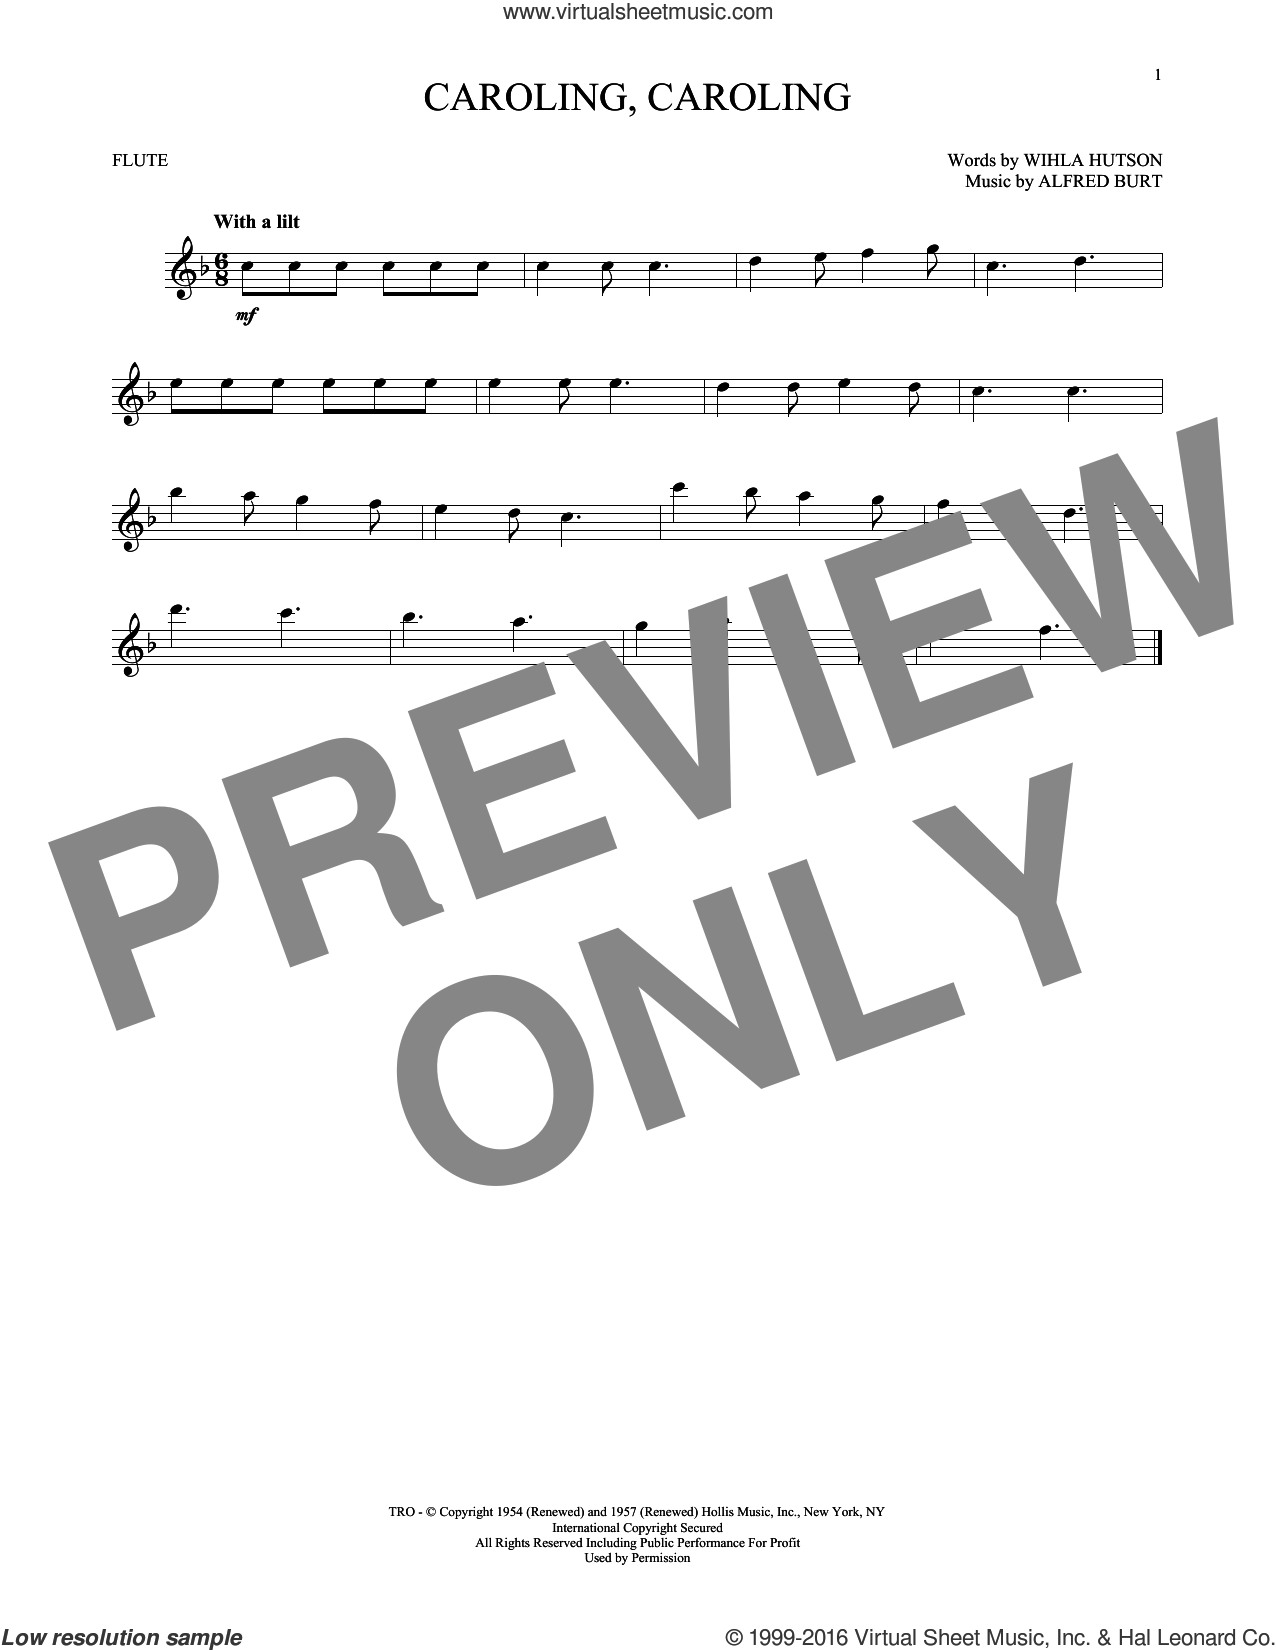 Caroling, Caroling sheet music for flute solo by Alfred Burt and Wihla Hutson, intermediate skill level